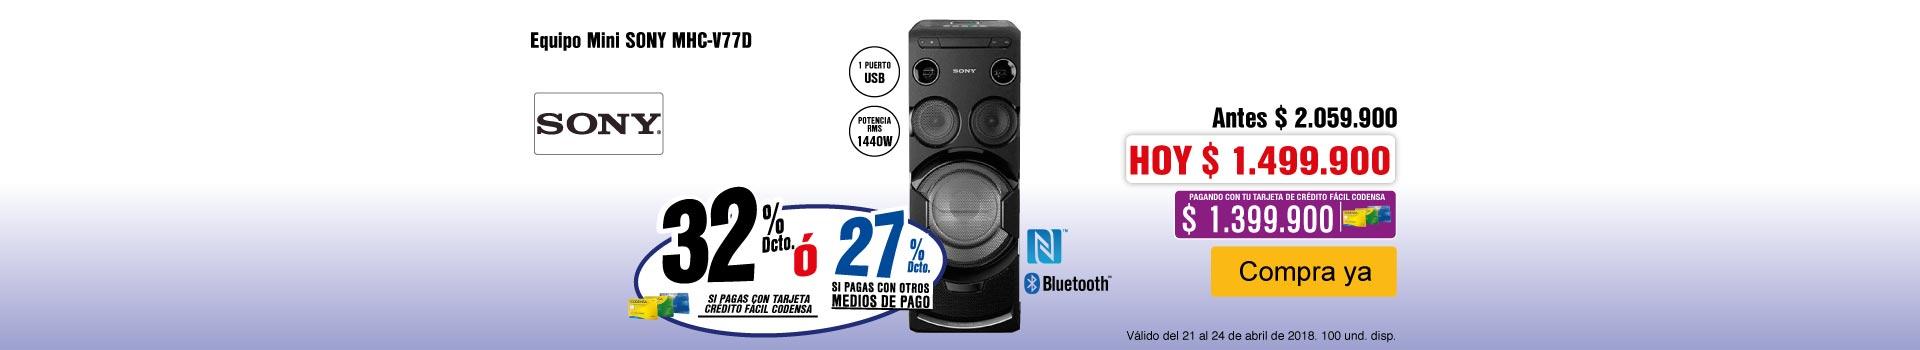 AK-KT-BCAT-1-audio-PP---Sony-MHC-V77D-Abr21